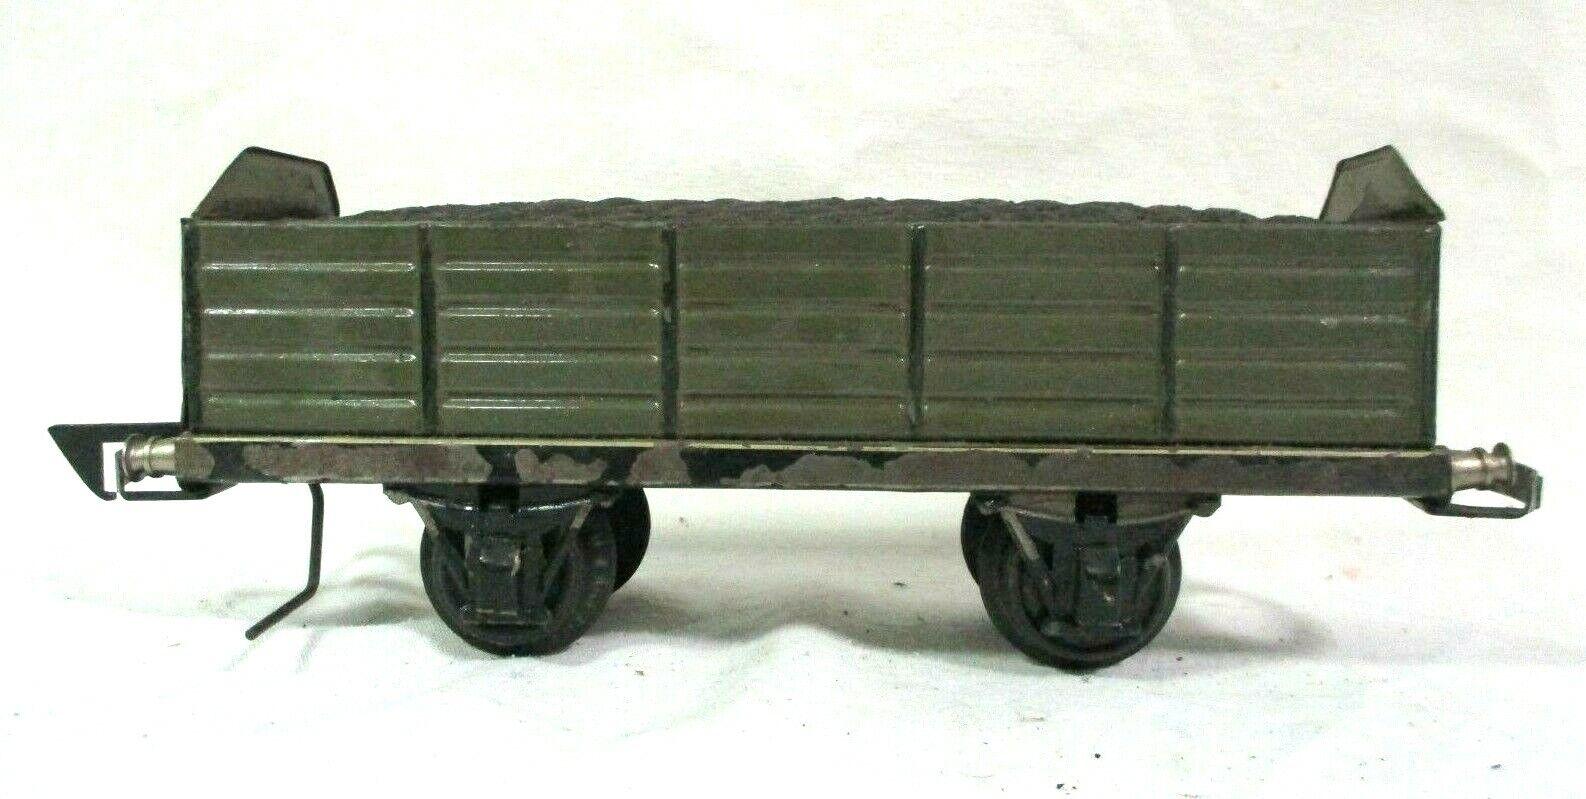 Marklin 1 Gauge Gondola with Coal Pre War Model Railway Train Freight Car B64-38